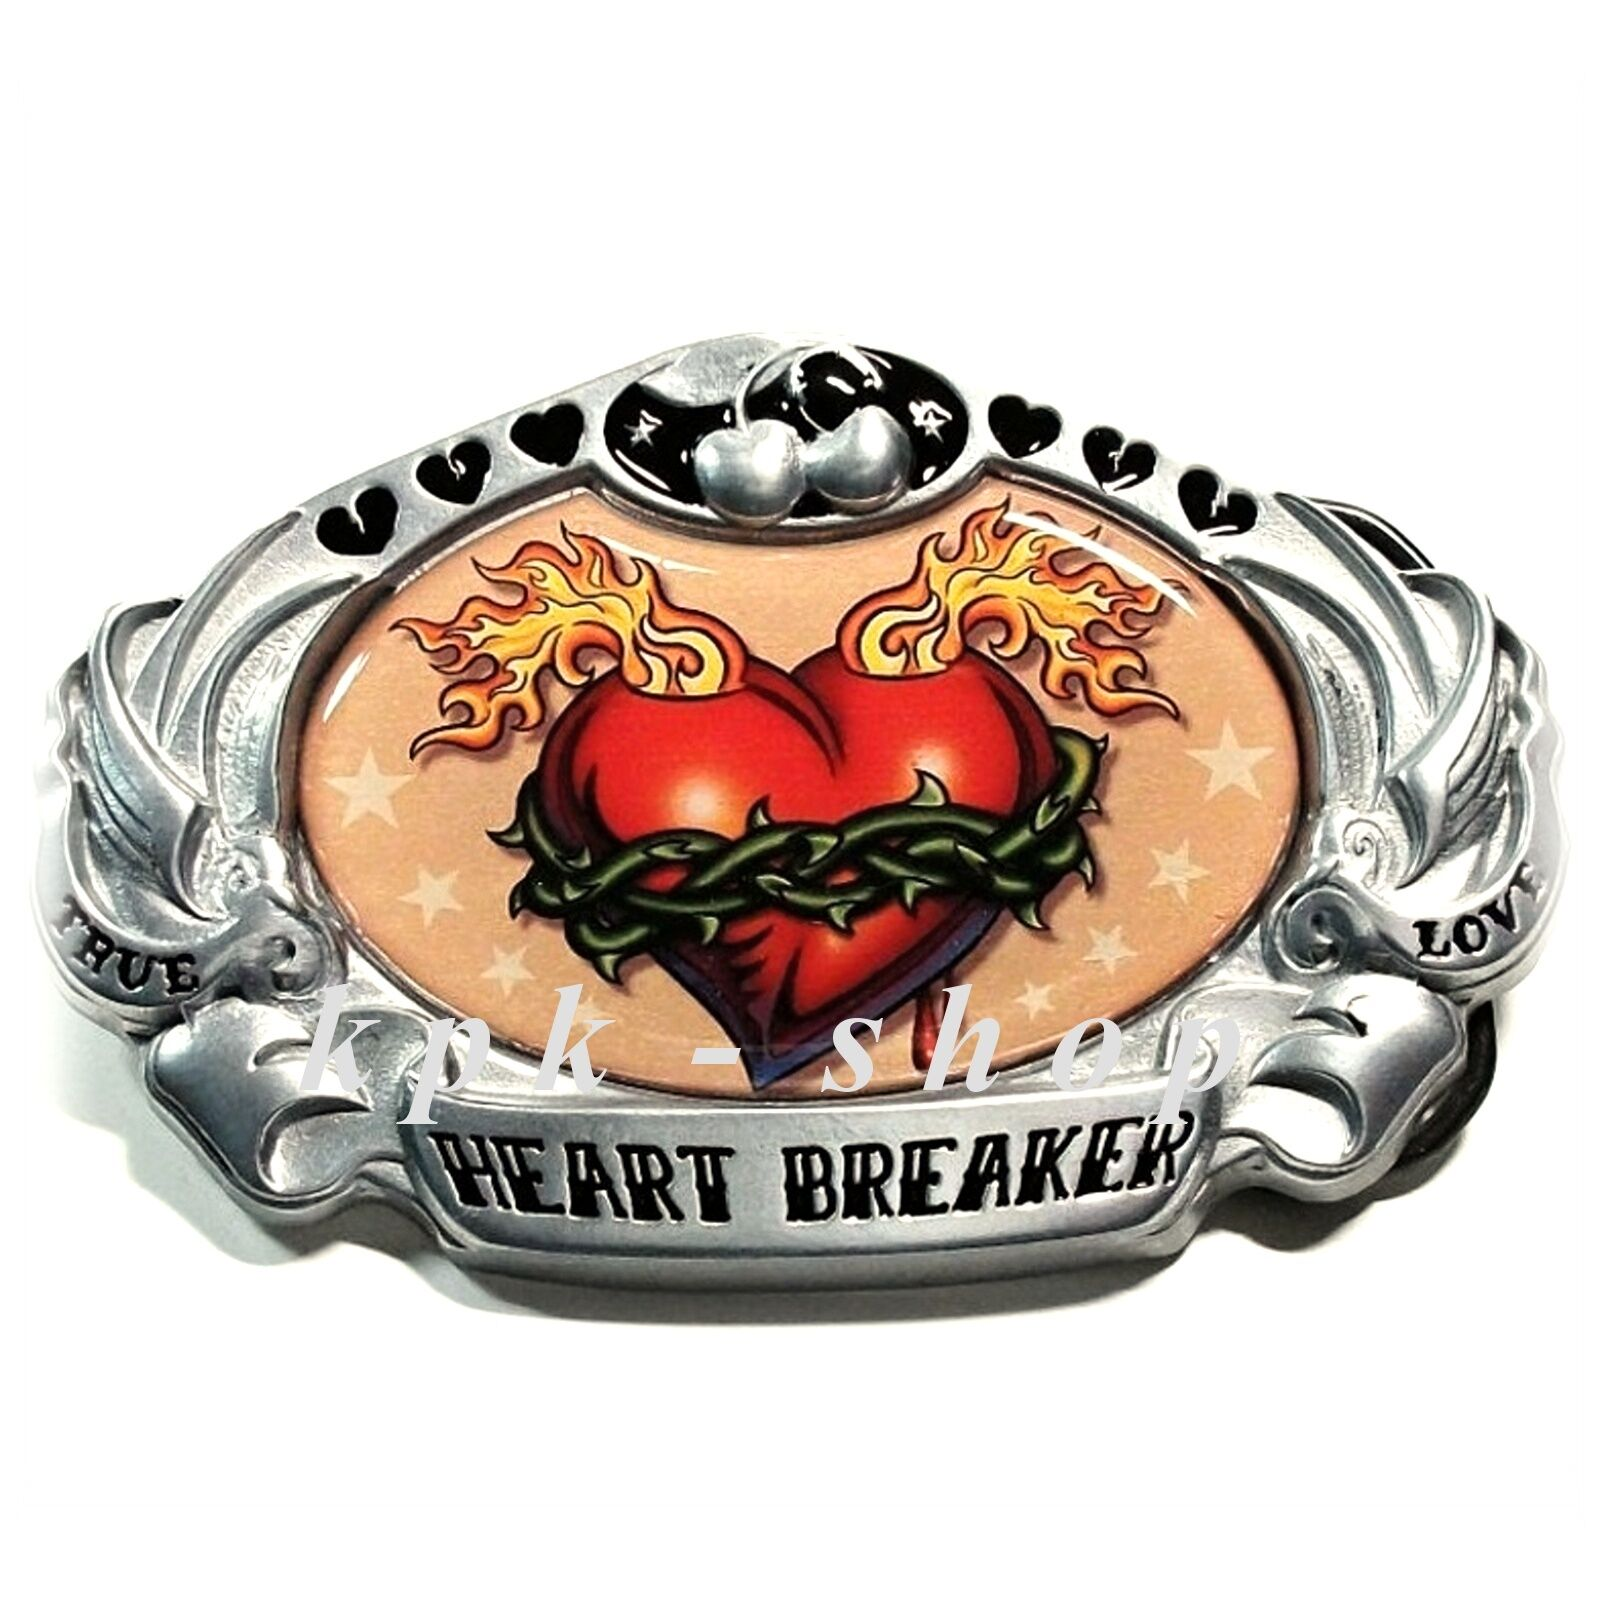 002 Gürtelschnalle Heart Breaker Buckle Buckles Wechselgürtel Biker